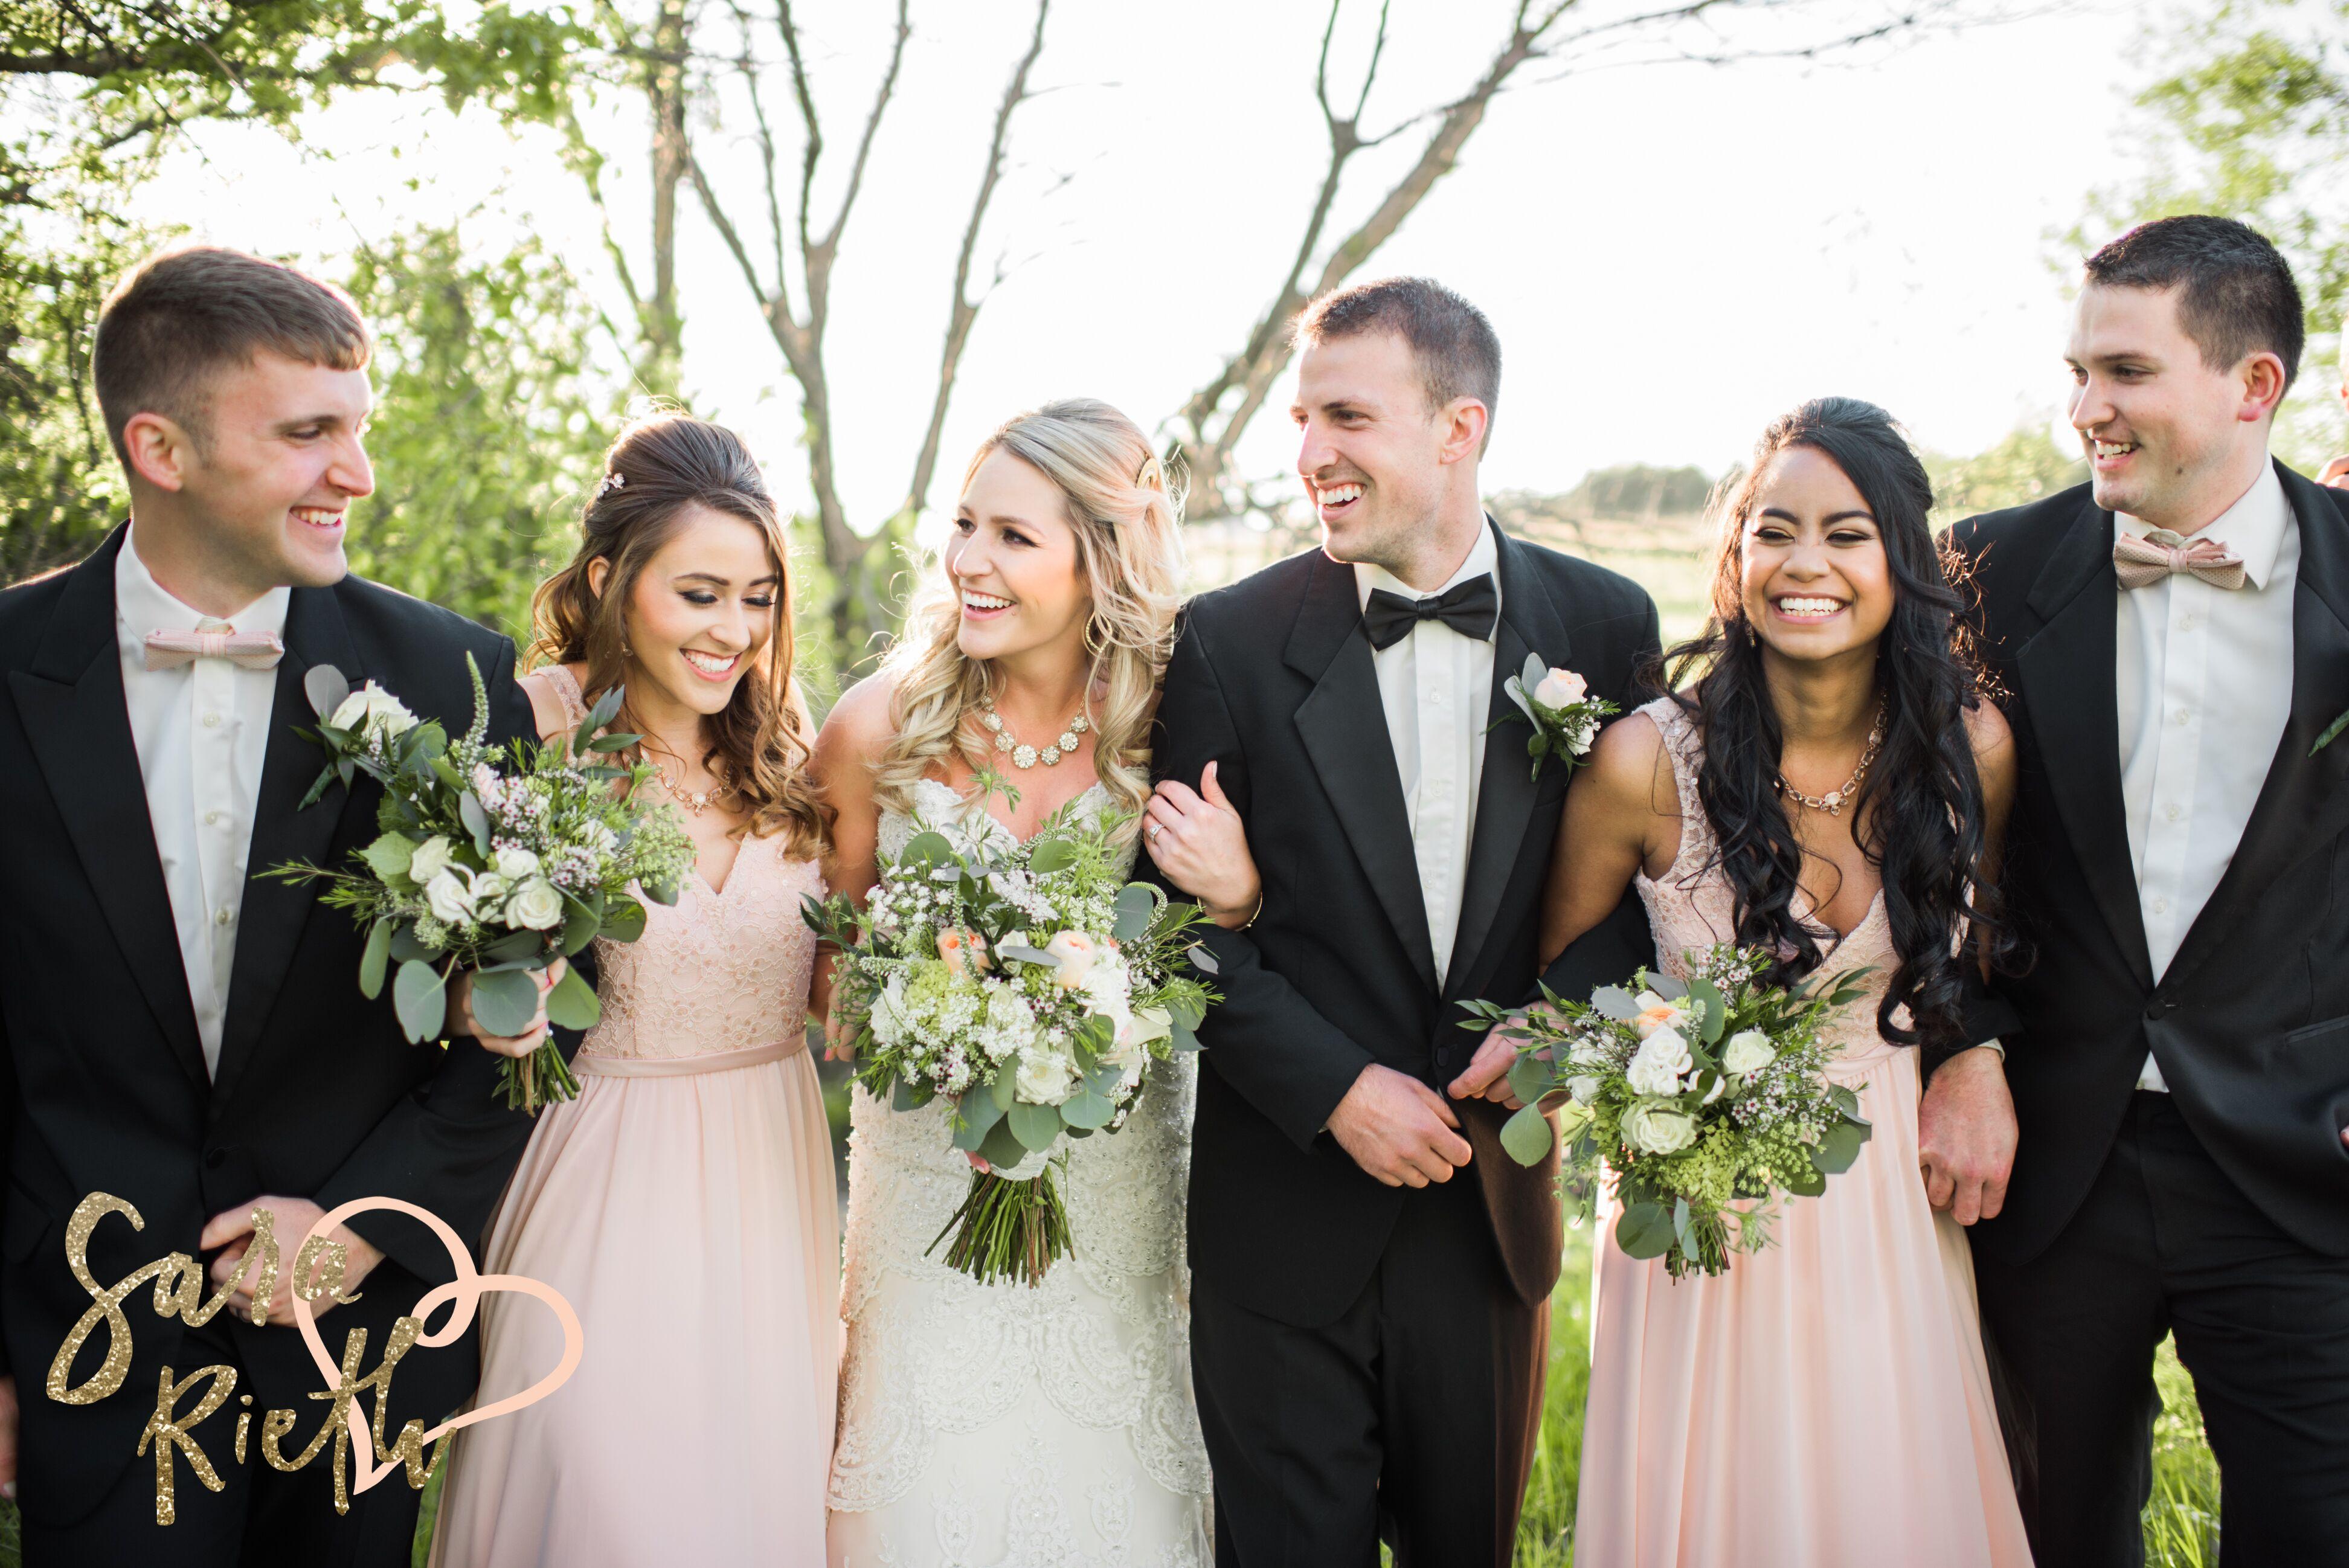 Sara rieth romantic storytelling wedding photographer for Wedding photographers wichita ks